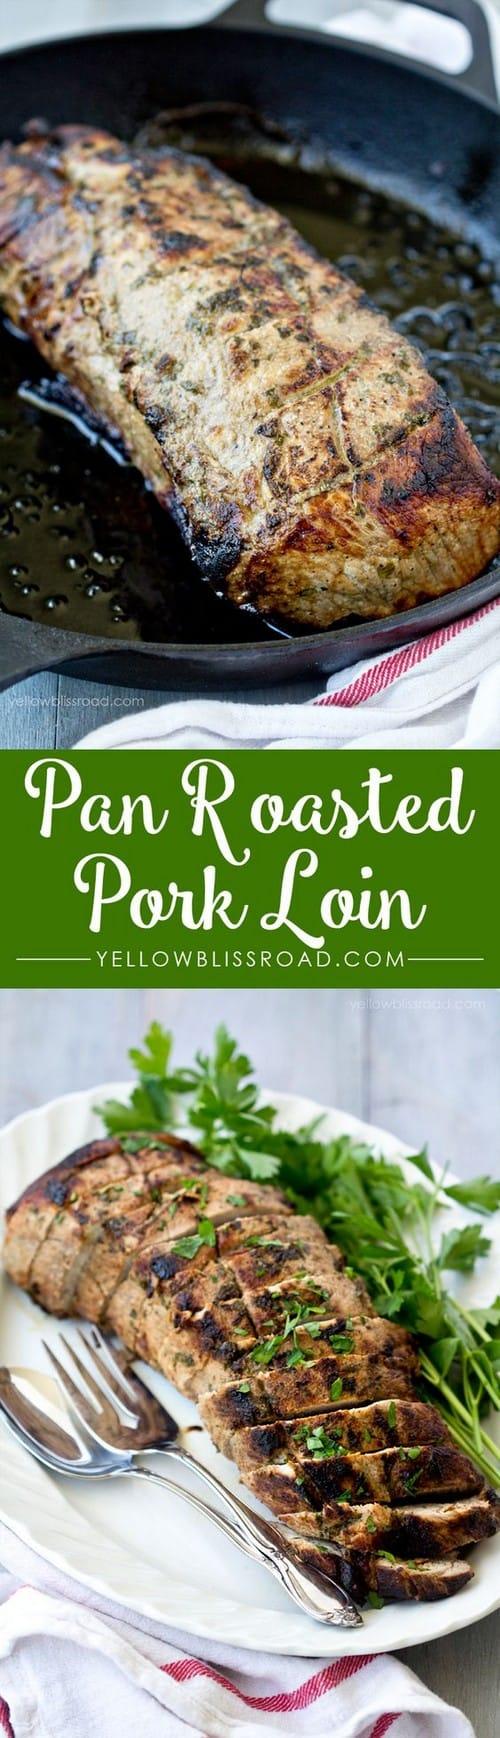 Mediterranean Pan Roasted Pork Loin